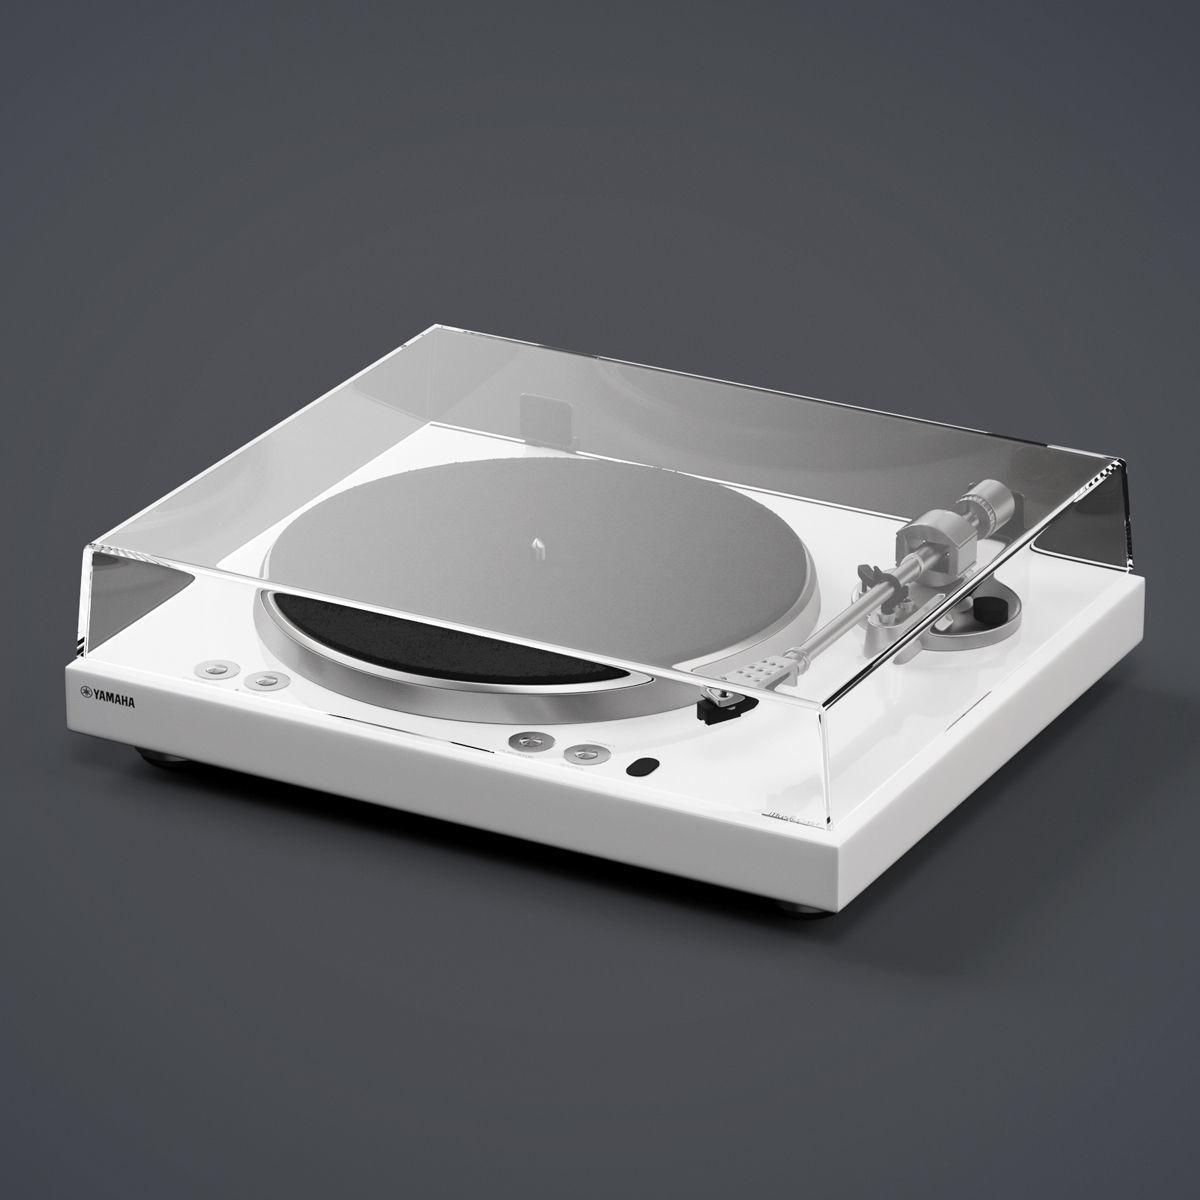 Yamaha MusicCast Vinyl 500 Turntable